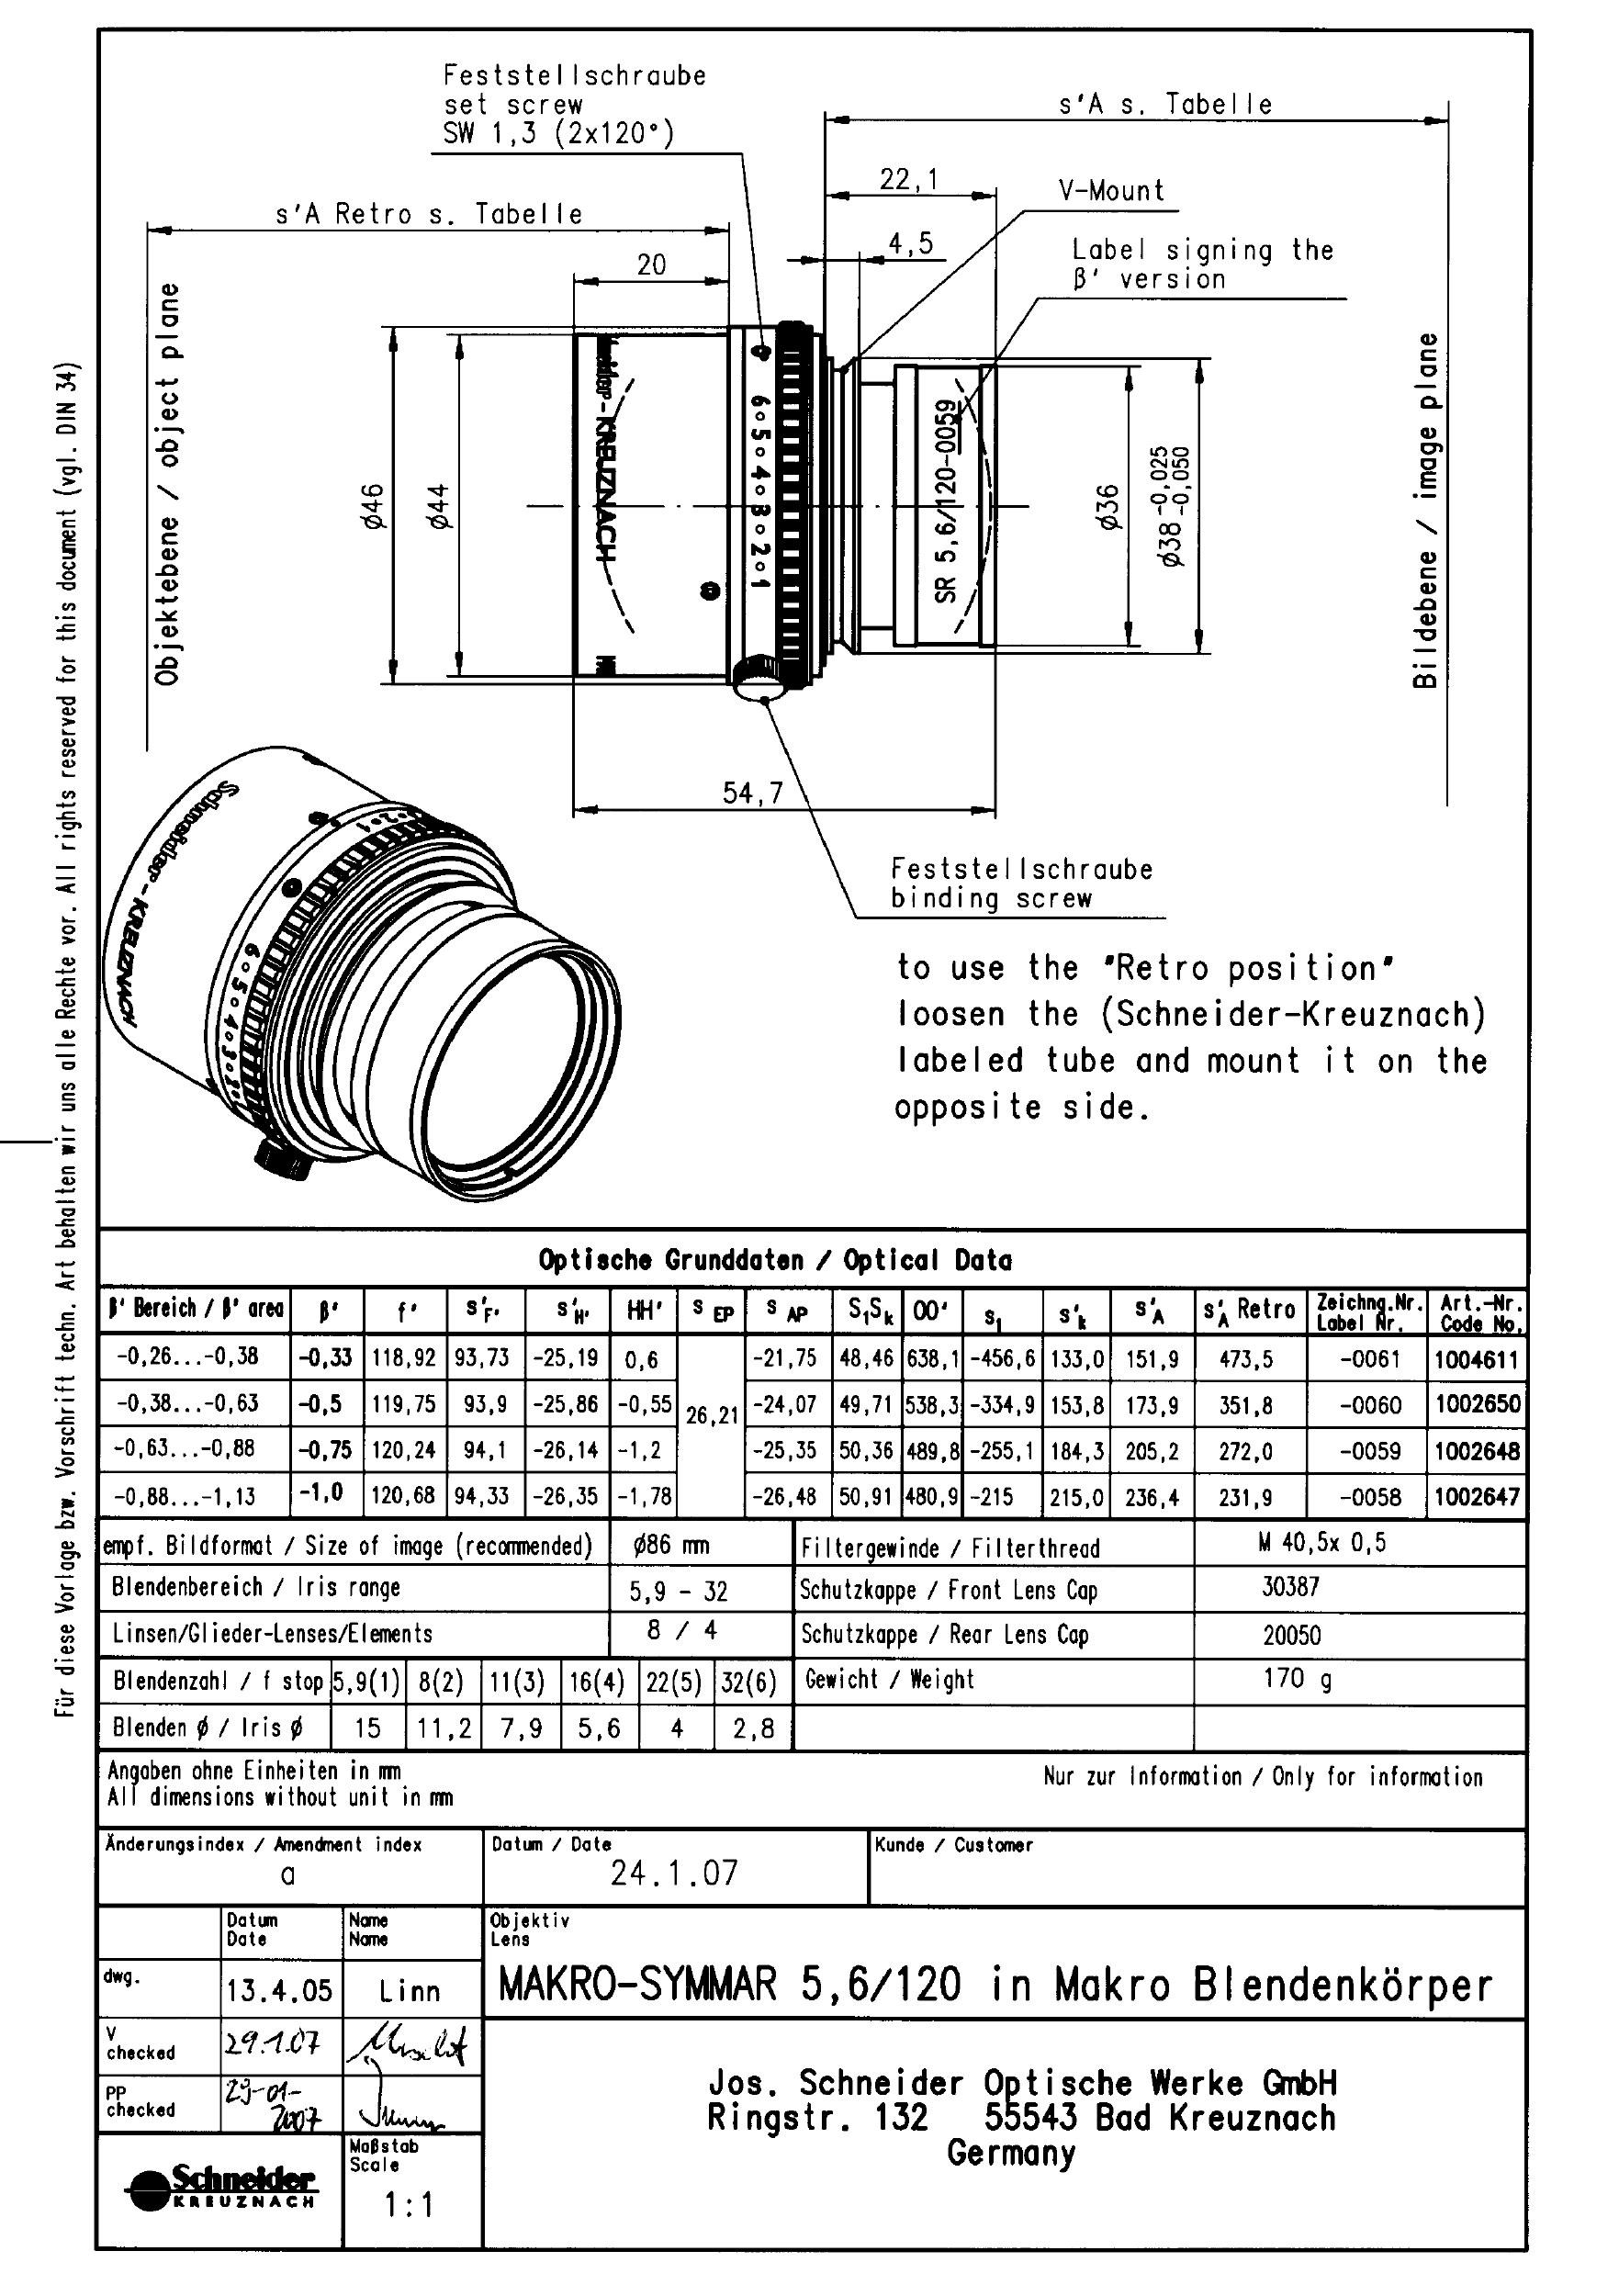 Makro-Symmar-120-f5.6-SR-data-sheet.jpg